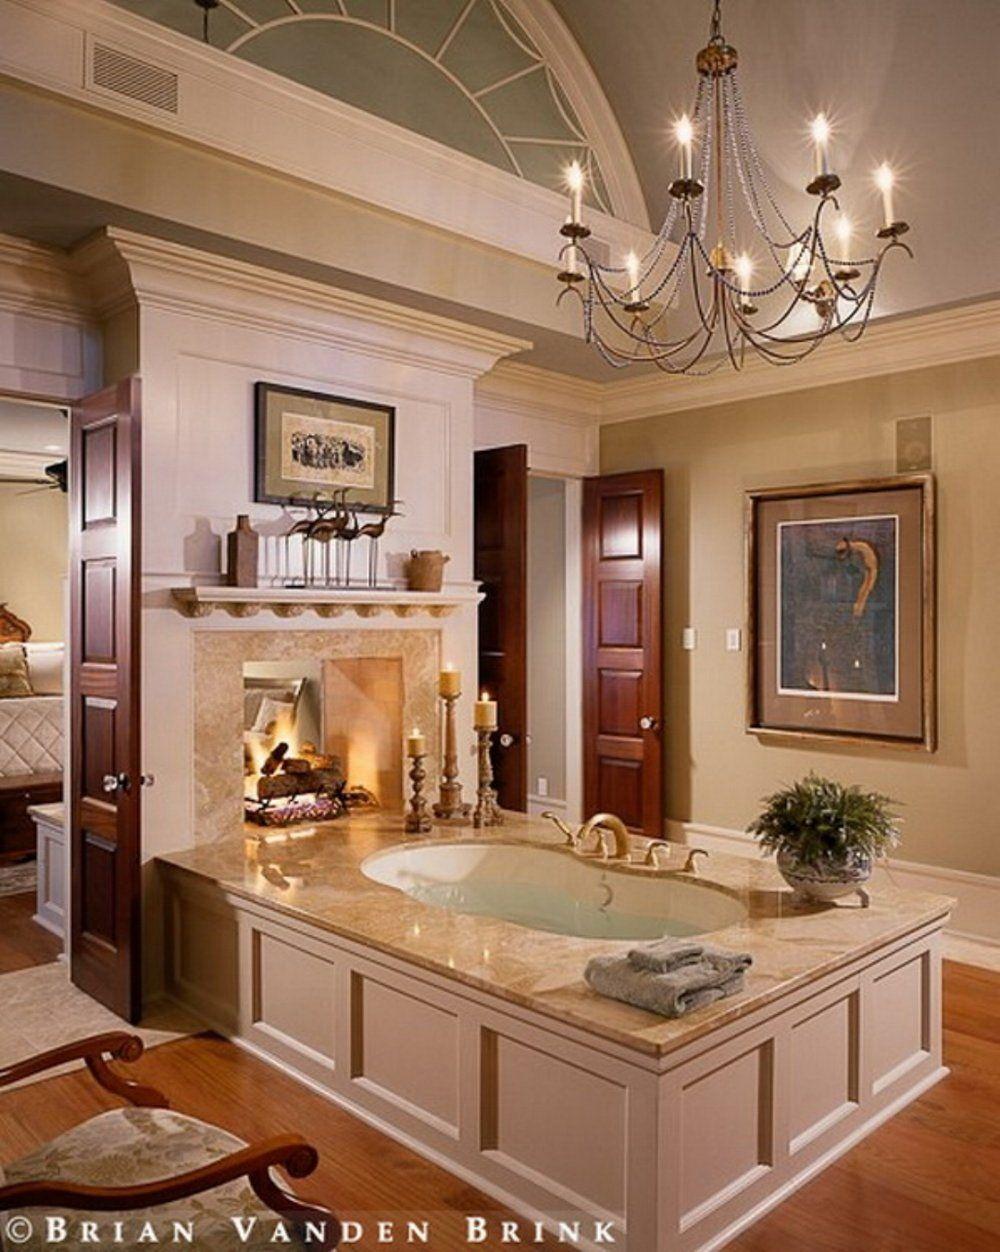 26 trending luxury master bathroom designs luxury on home inspirations this year the perfect dream bathrooms diy bathroom ideas id=41771